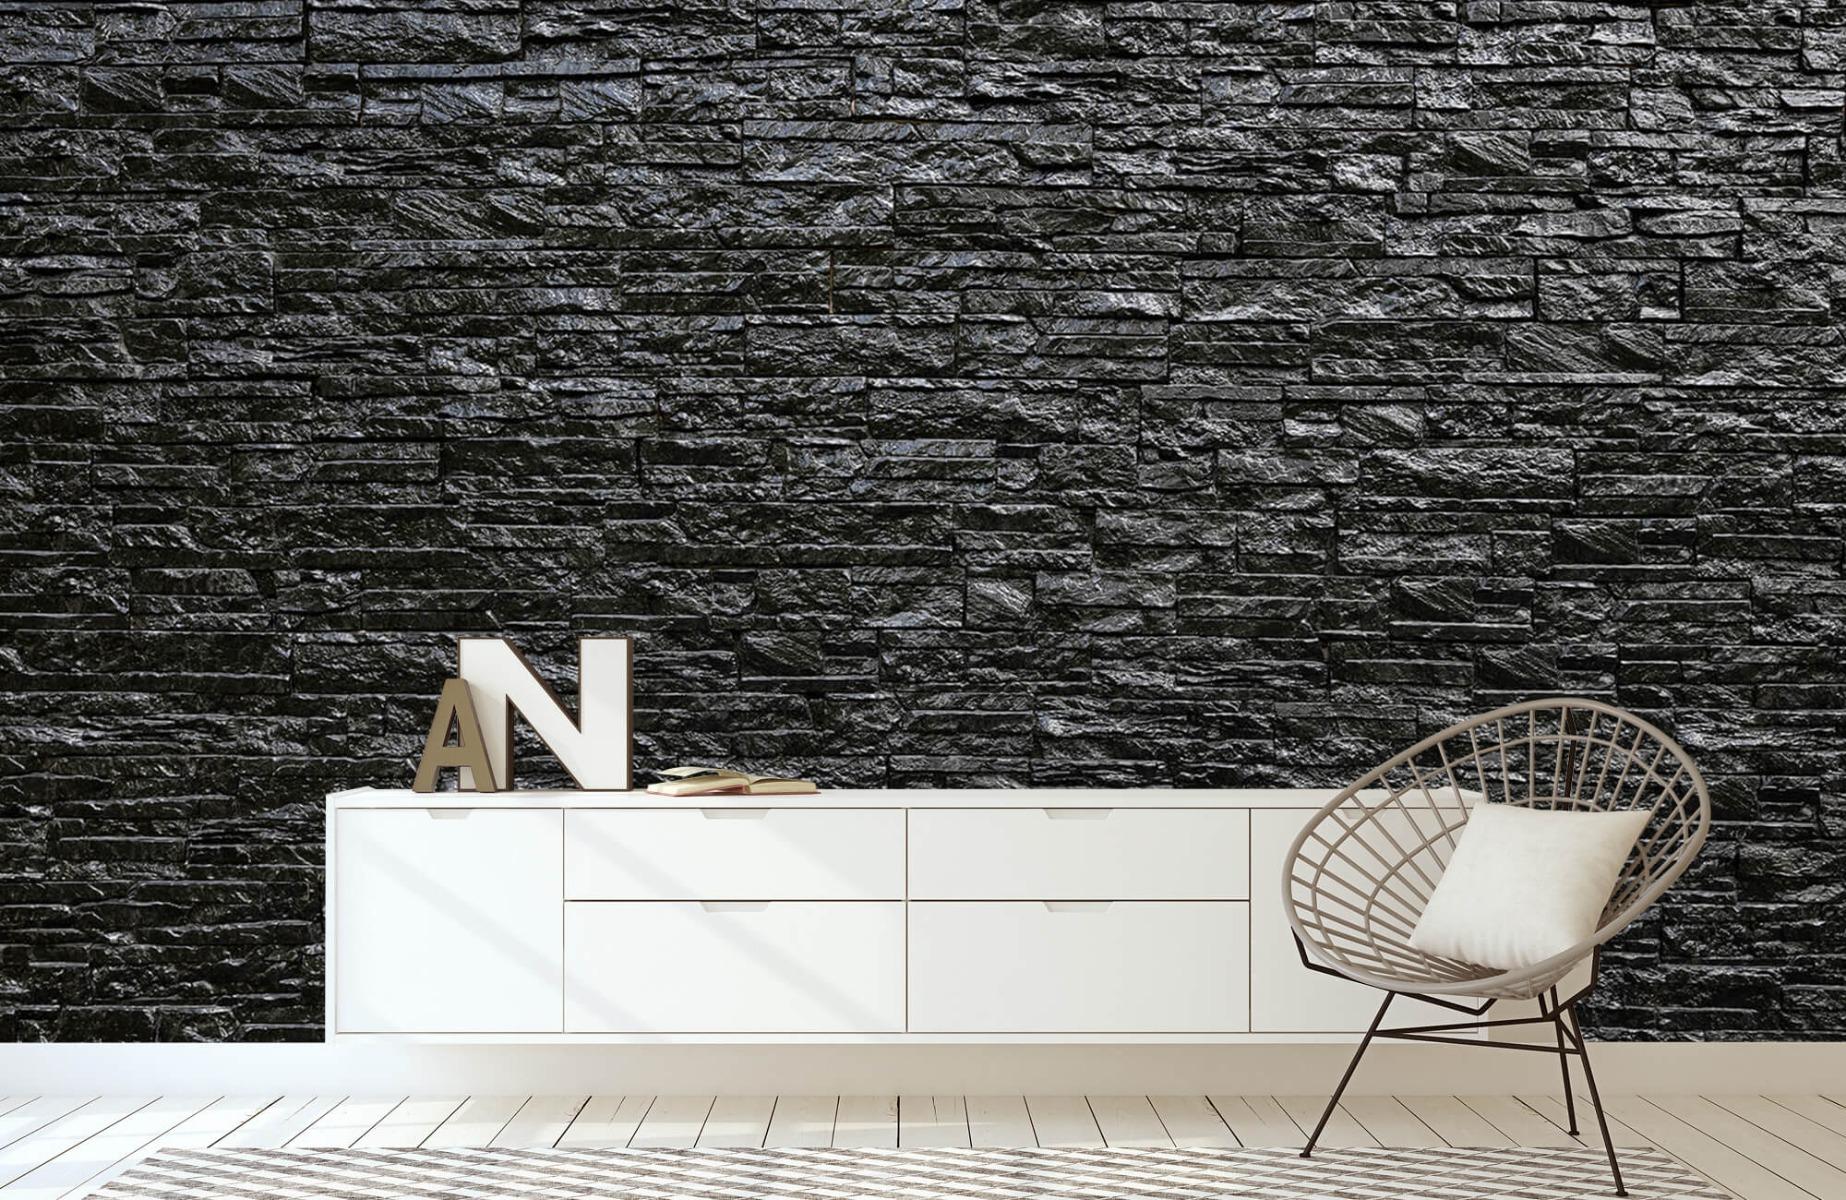 Steen behang - Zwarte stenen - Slaapkamer 23